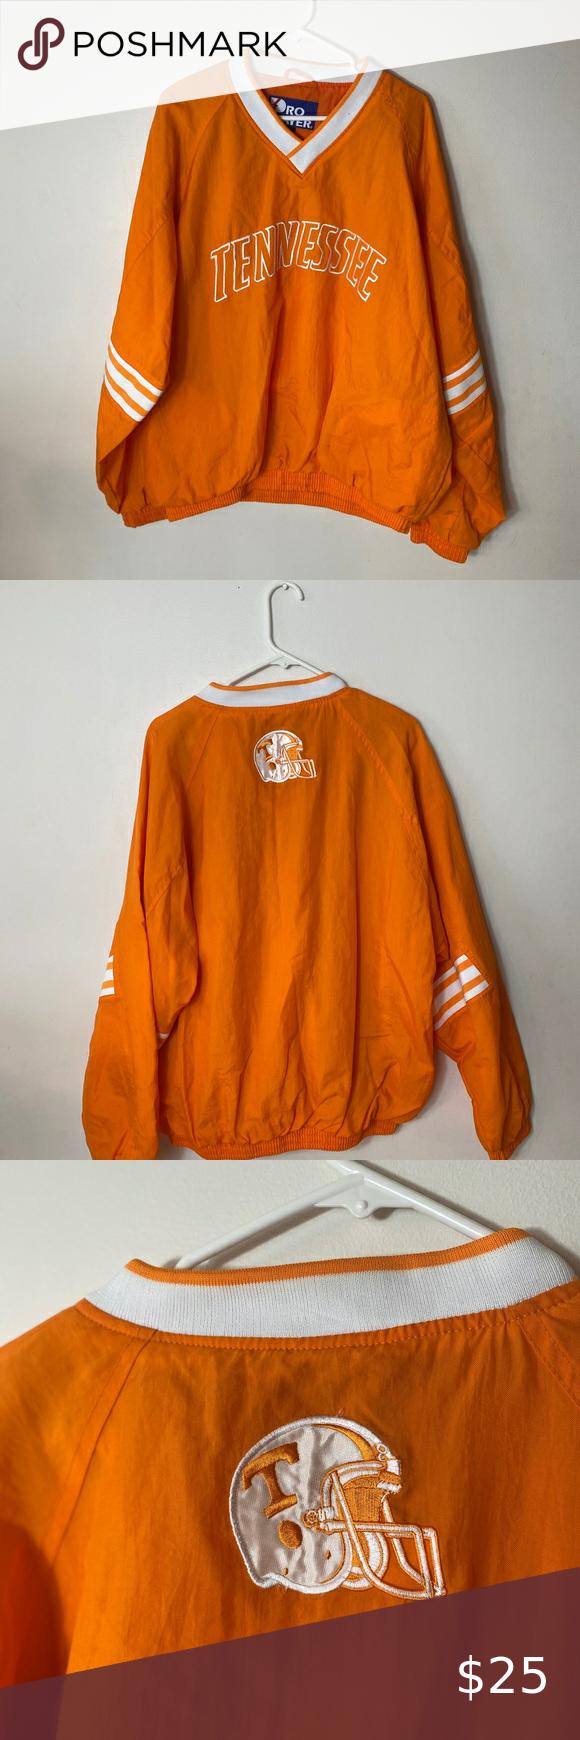 Tennessee Vintage Orange Pro Layer Pullover Pullover Sweatshirt Shirt Clothes Design [ 1740 x 580 Pixel ]